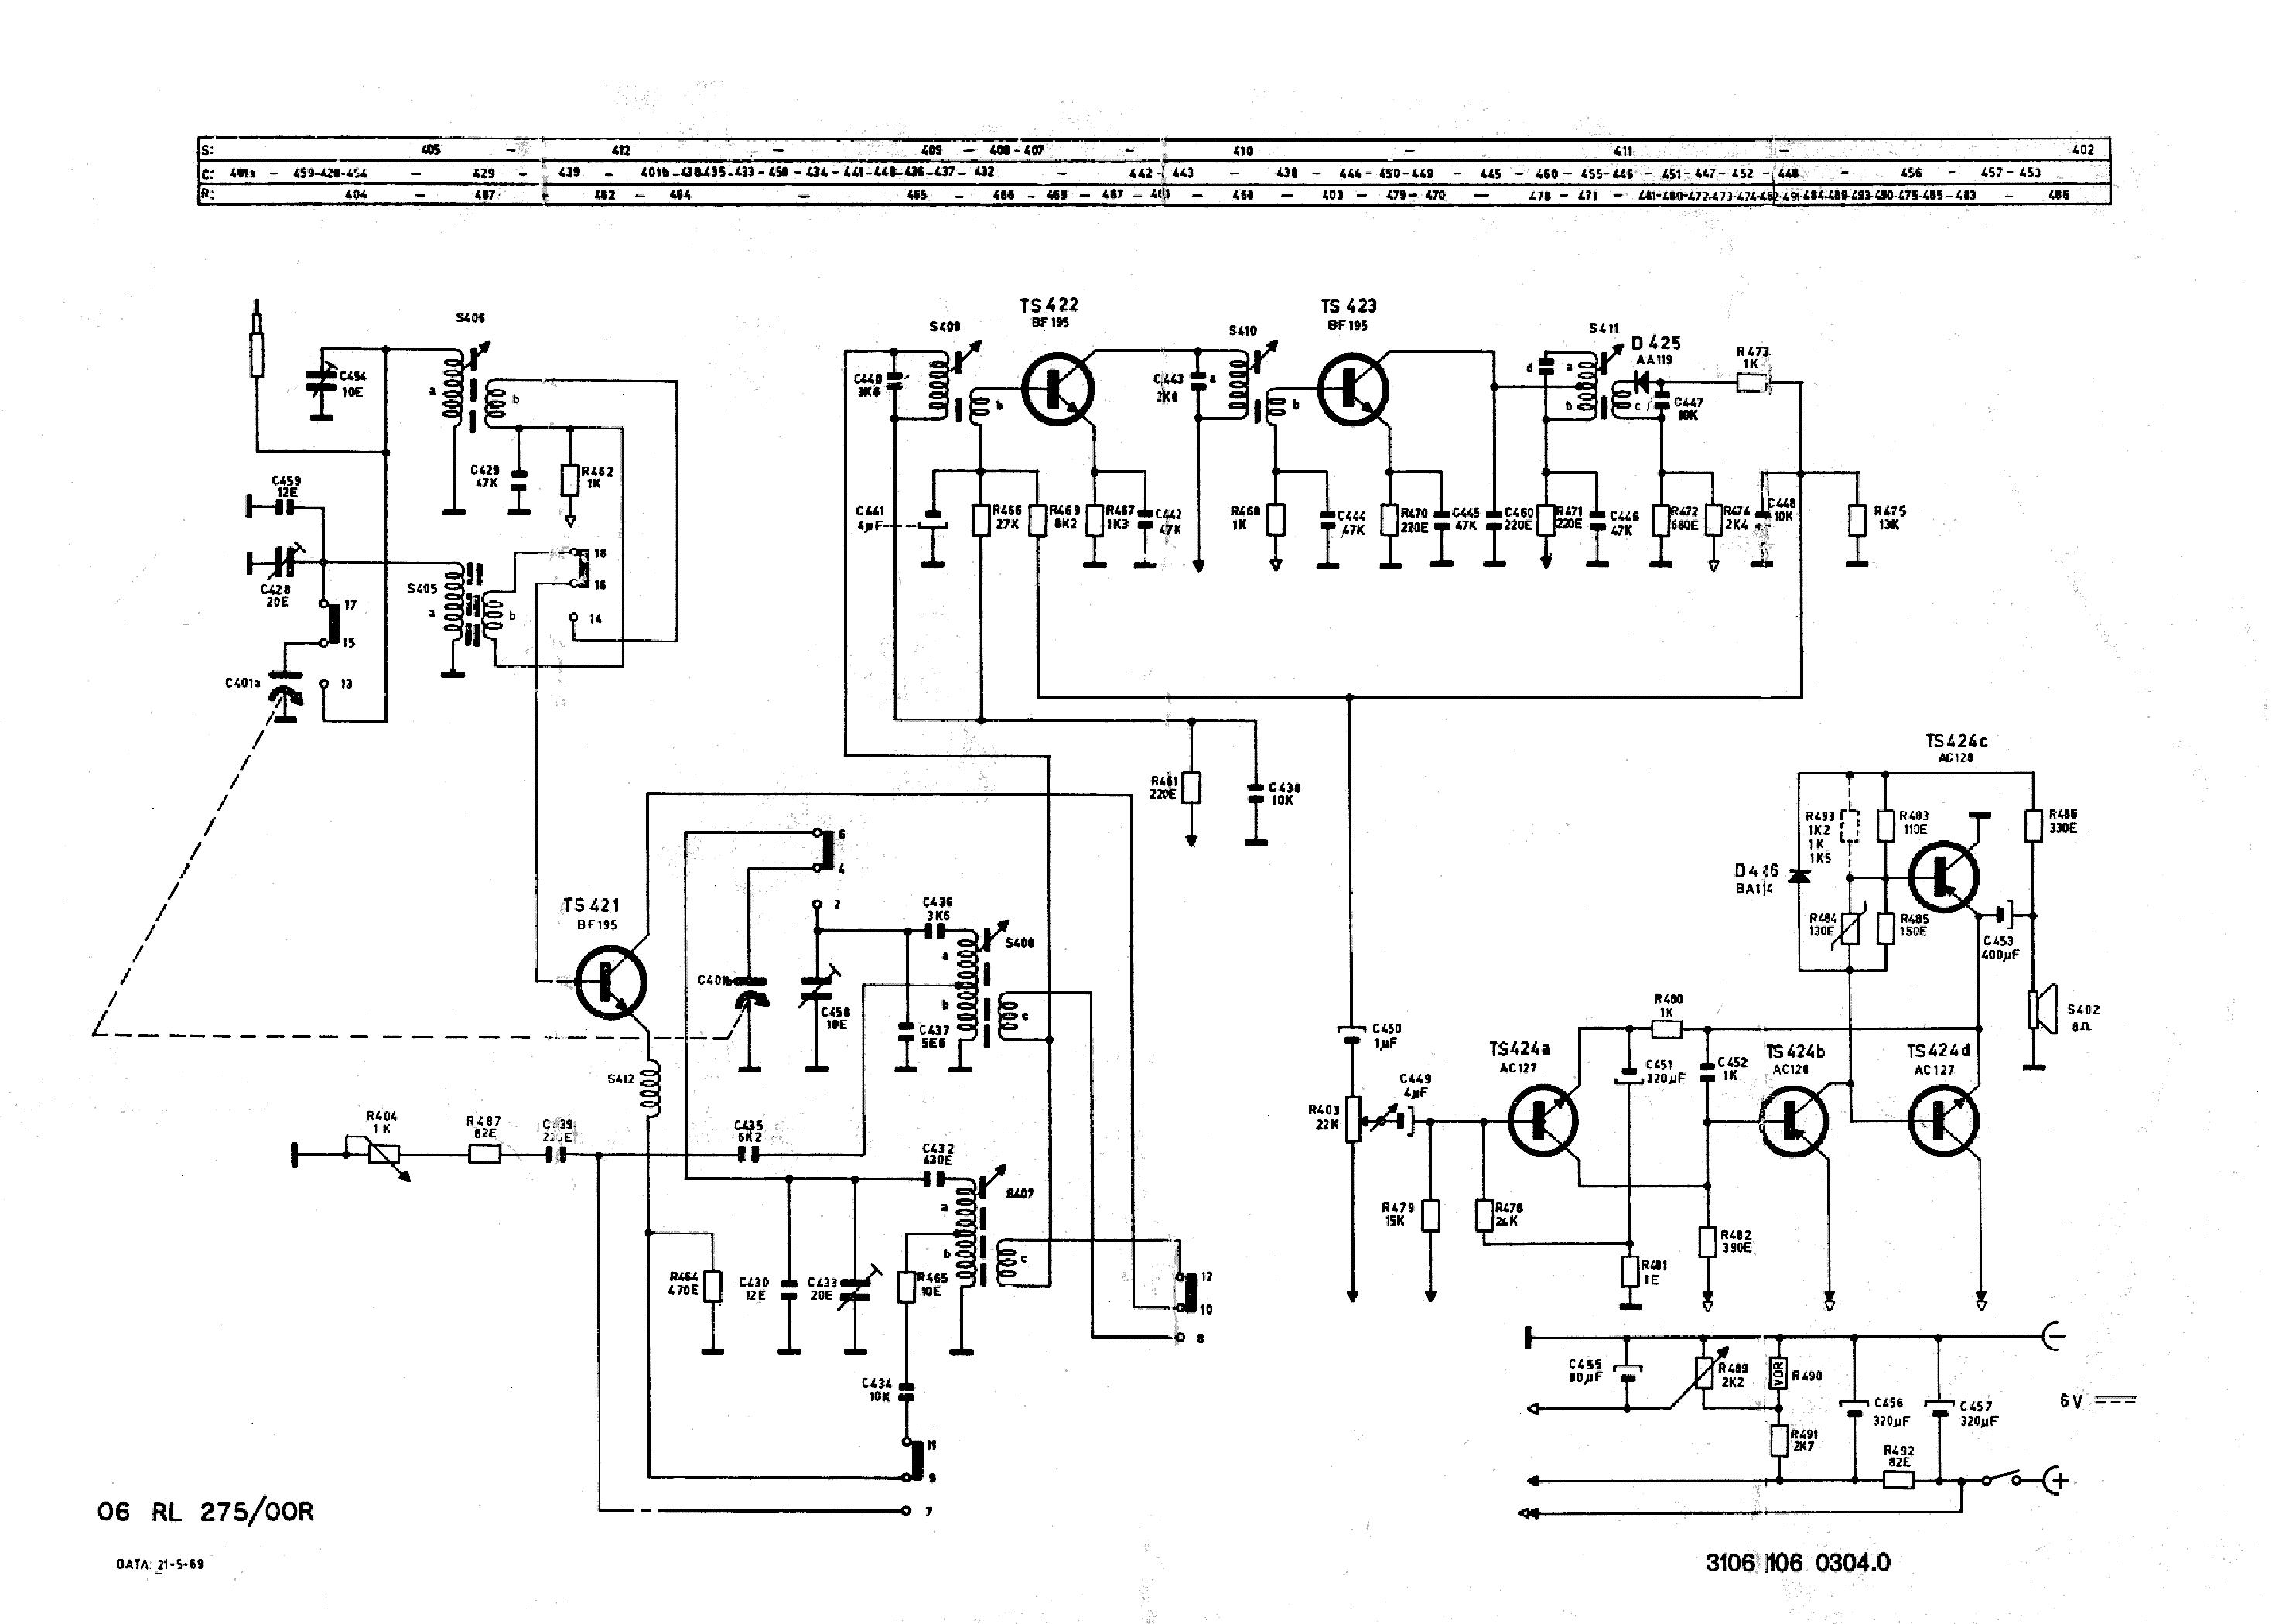 Wiring Diagram For Kenwood Kdc X591 : Car audio wiring diagram for kenwood kdc u